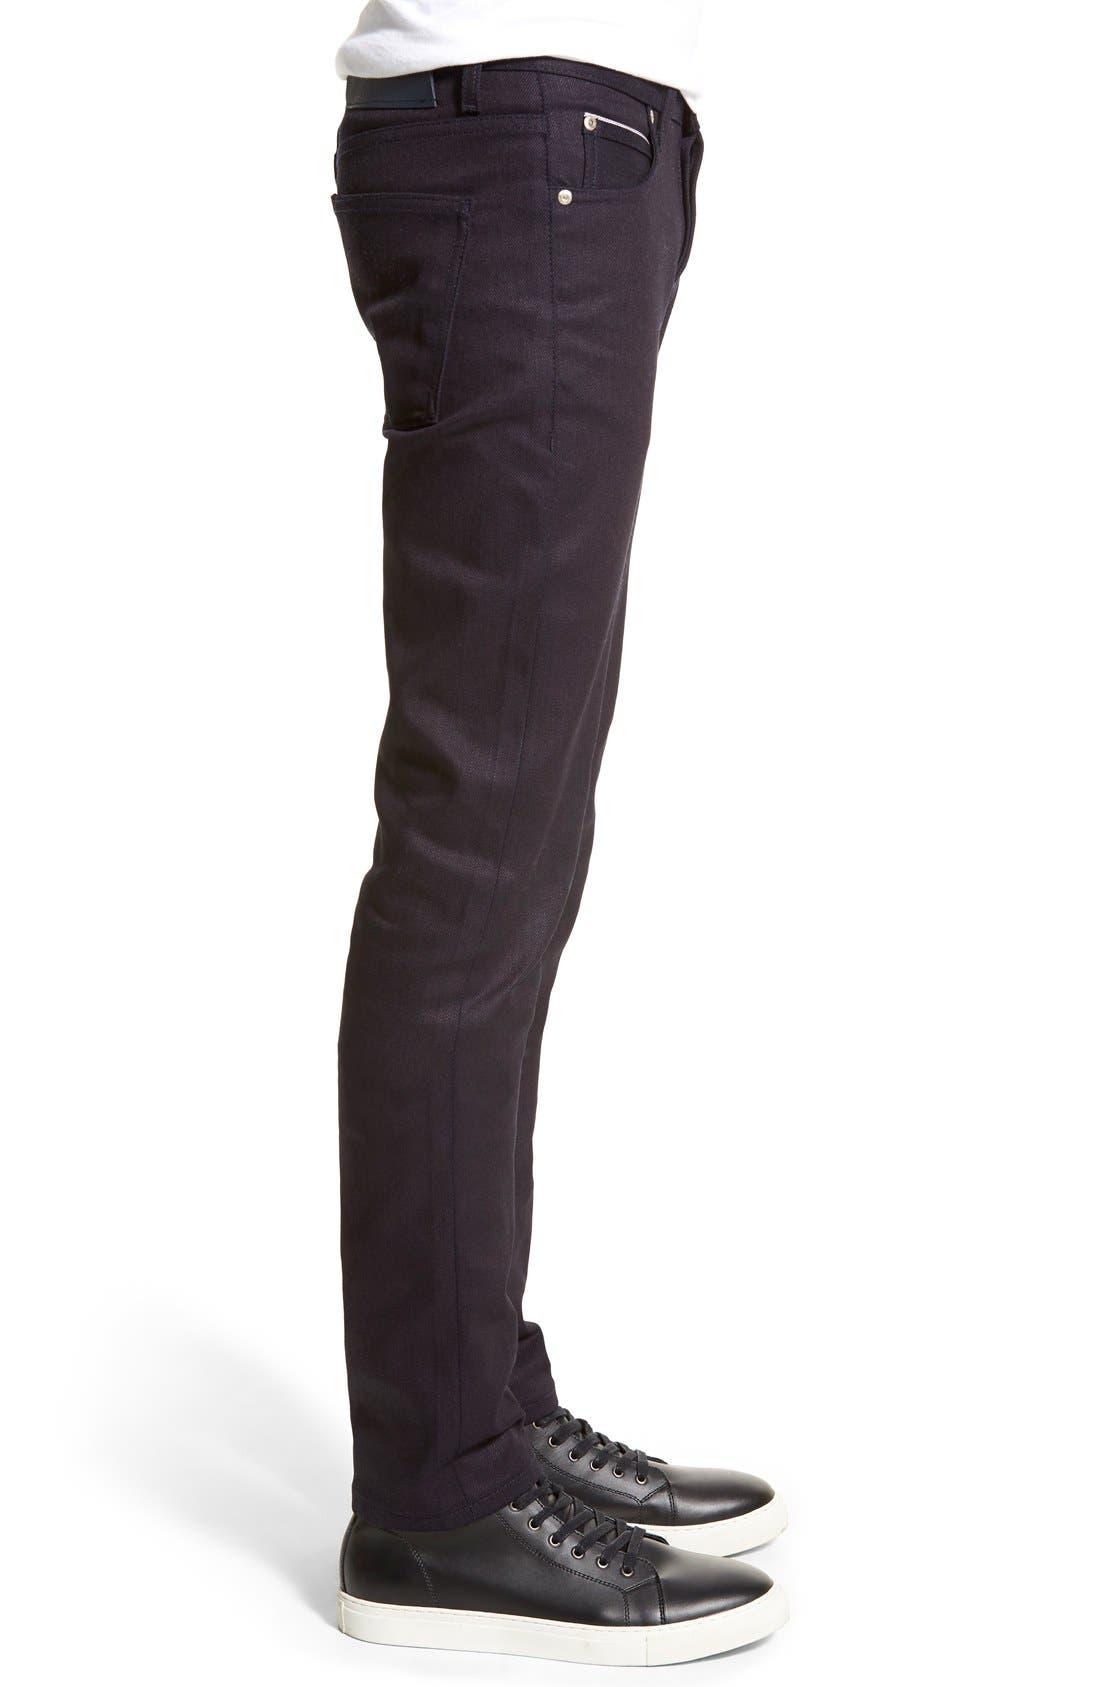 Super Skinny Guy Skinny Fit Jeans,                             Alternate thumbnail 2, color,                             INDIGO STRETCH SELVEDGE